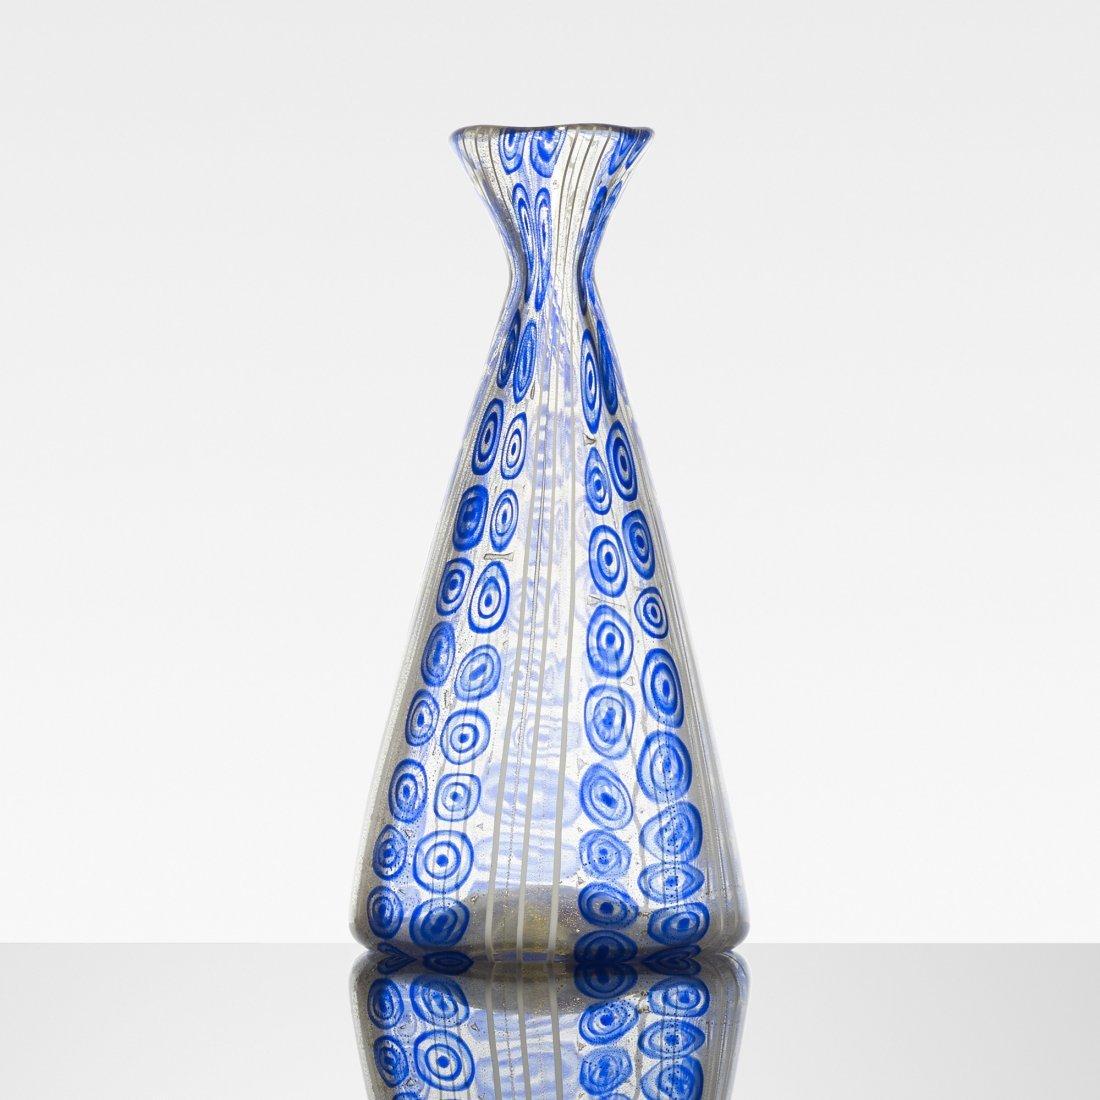 Ercole Barovier Saturneo vase